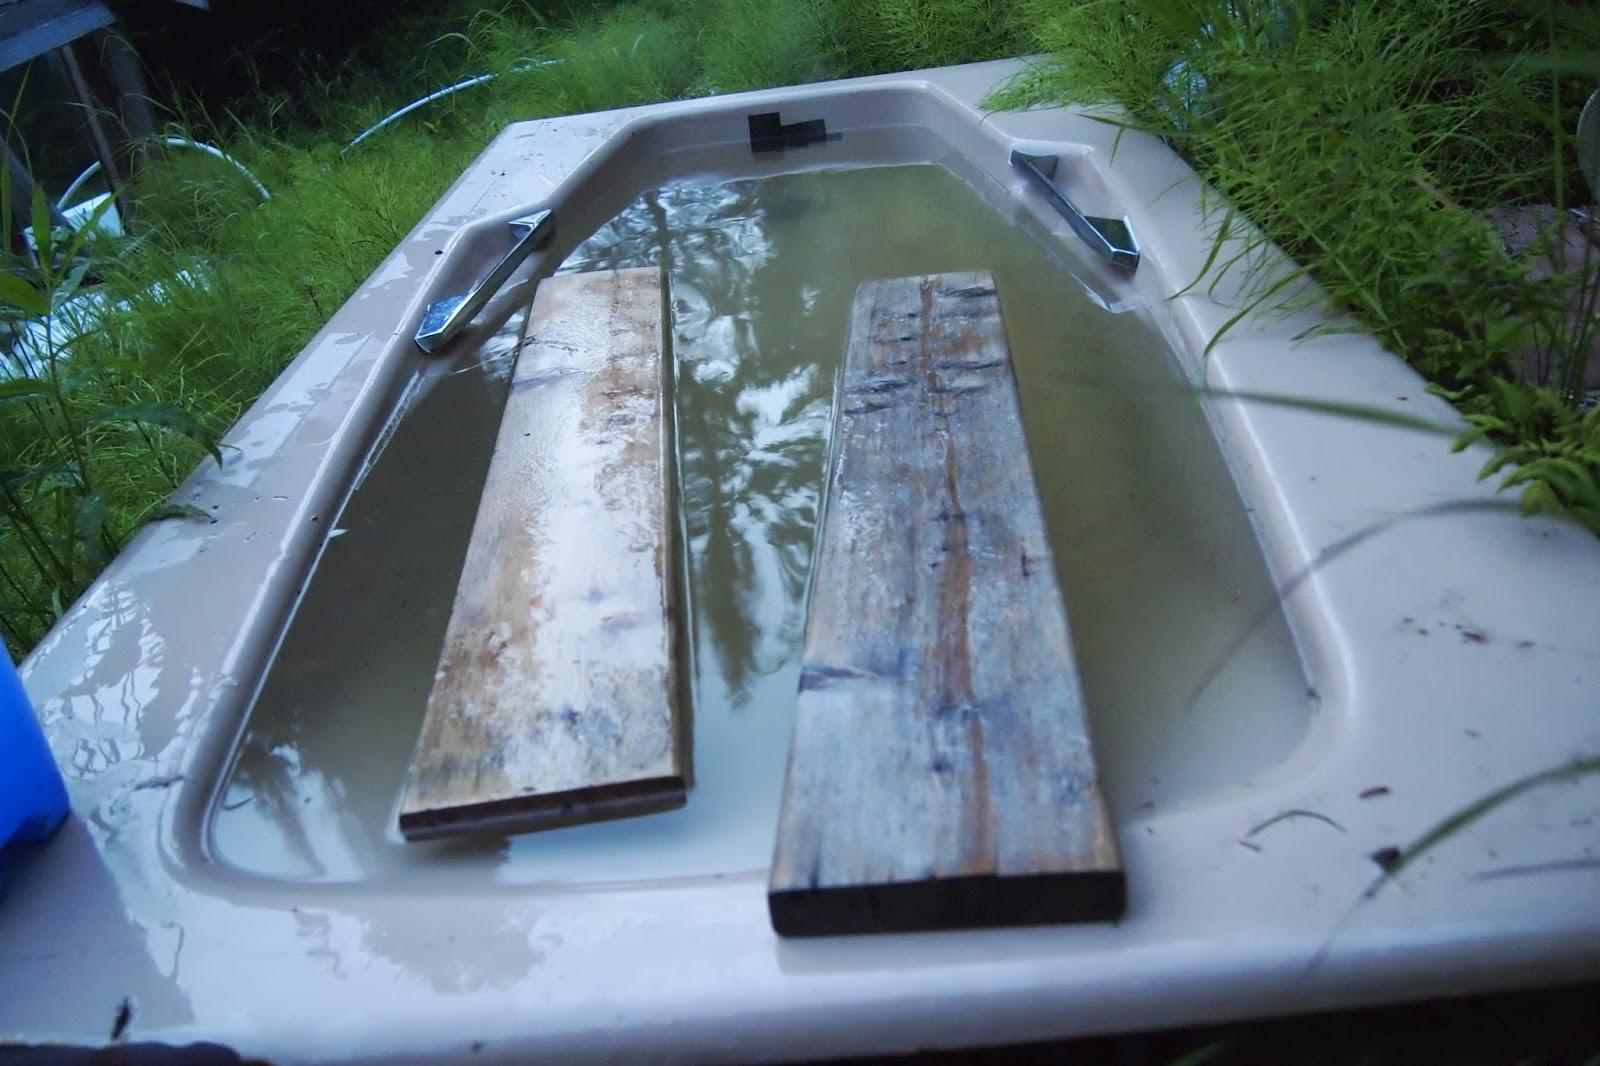 t i n y g o g o : Jennifer\'s wood-fired bathtub revisted